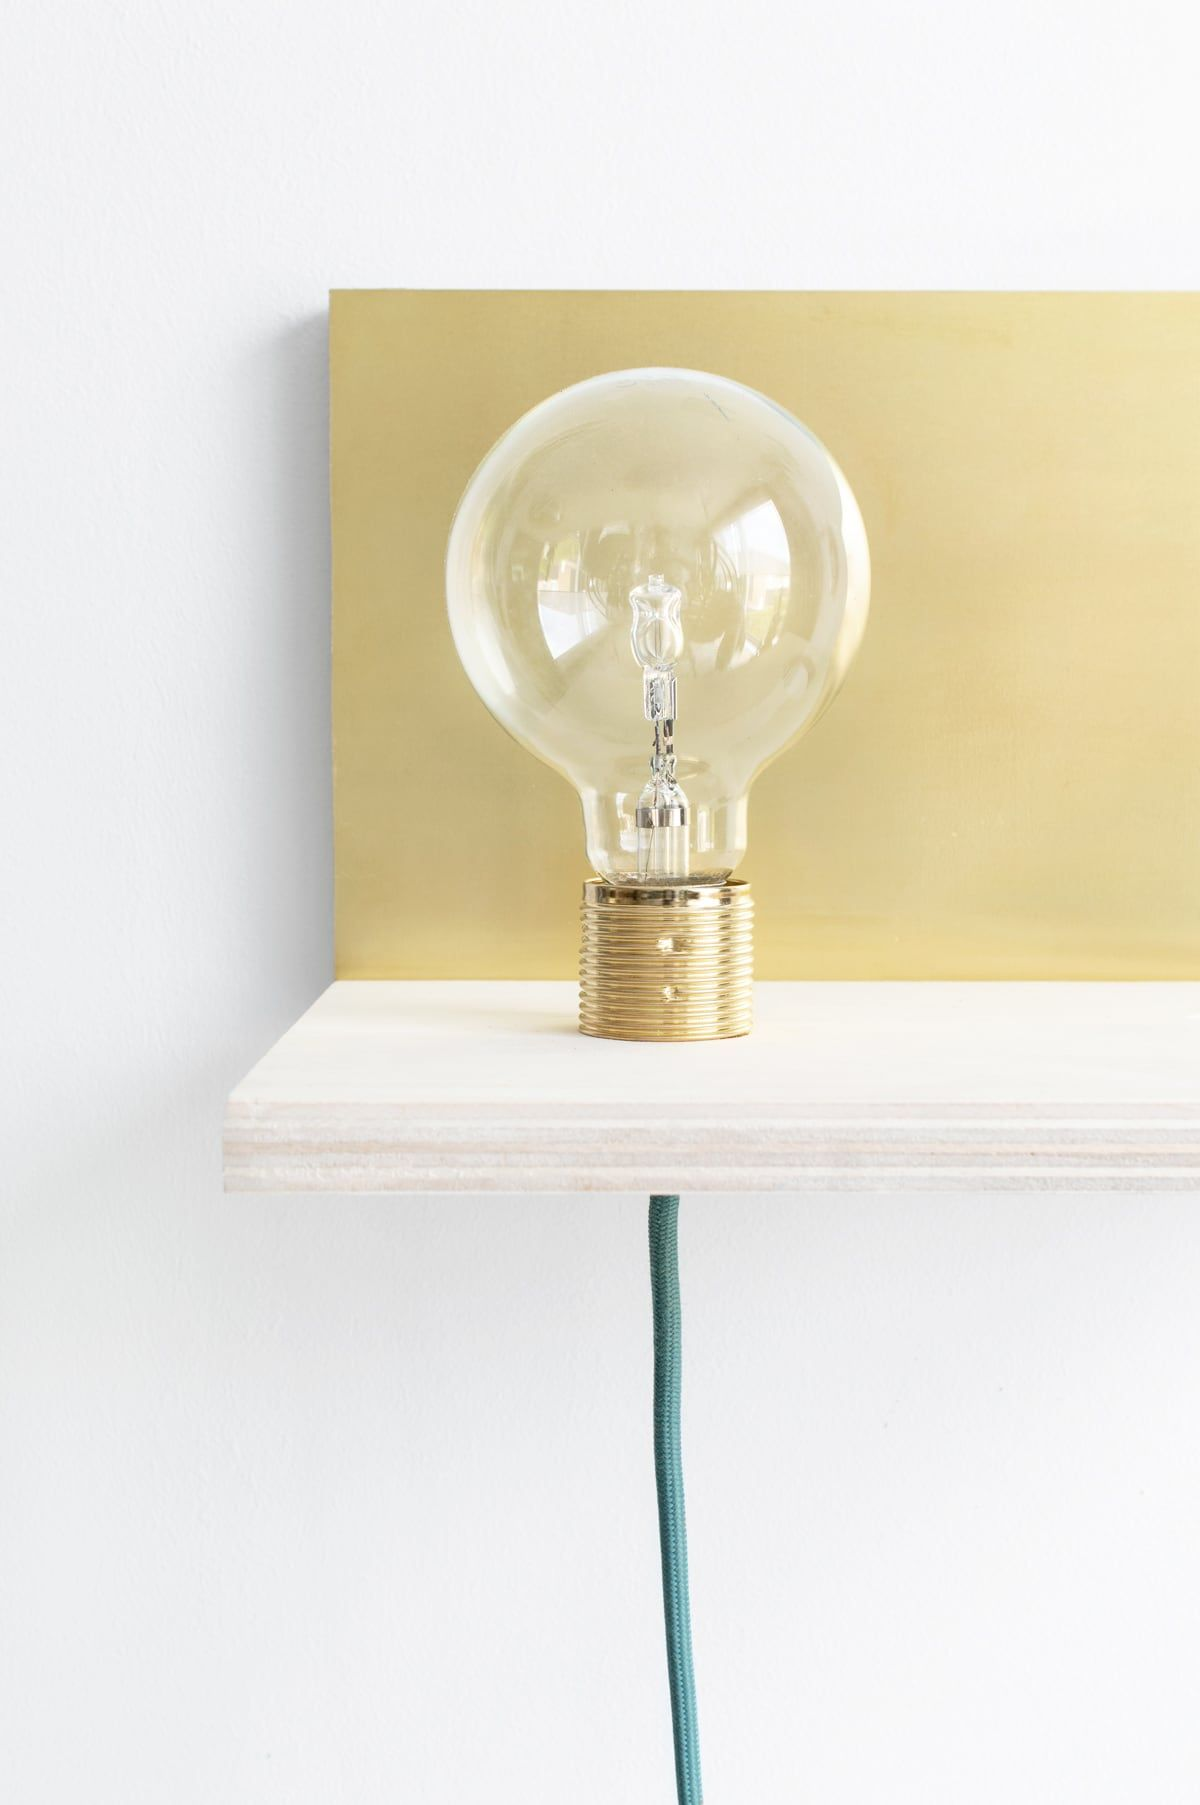 Wandplank Met Lamp.Diy Maak Je Eigen Zwevende Wandplank Met Lamp En Plantje